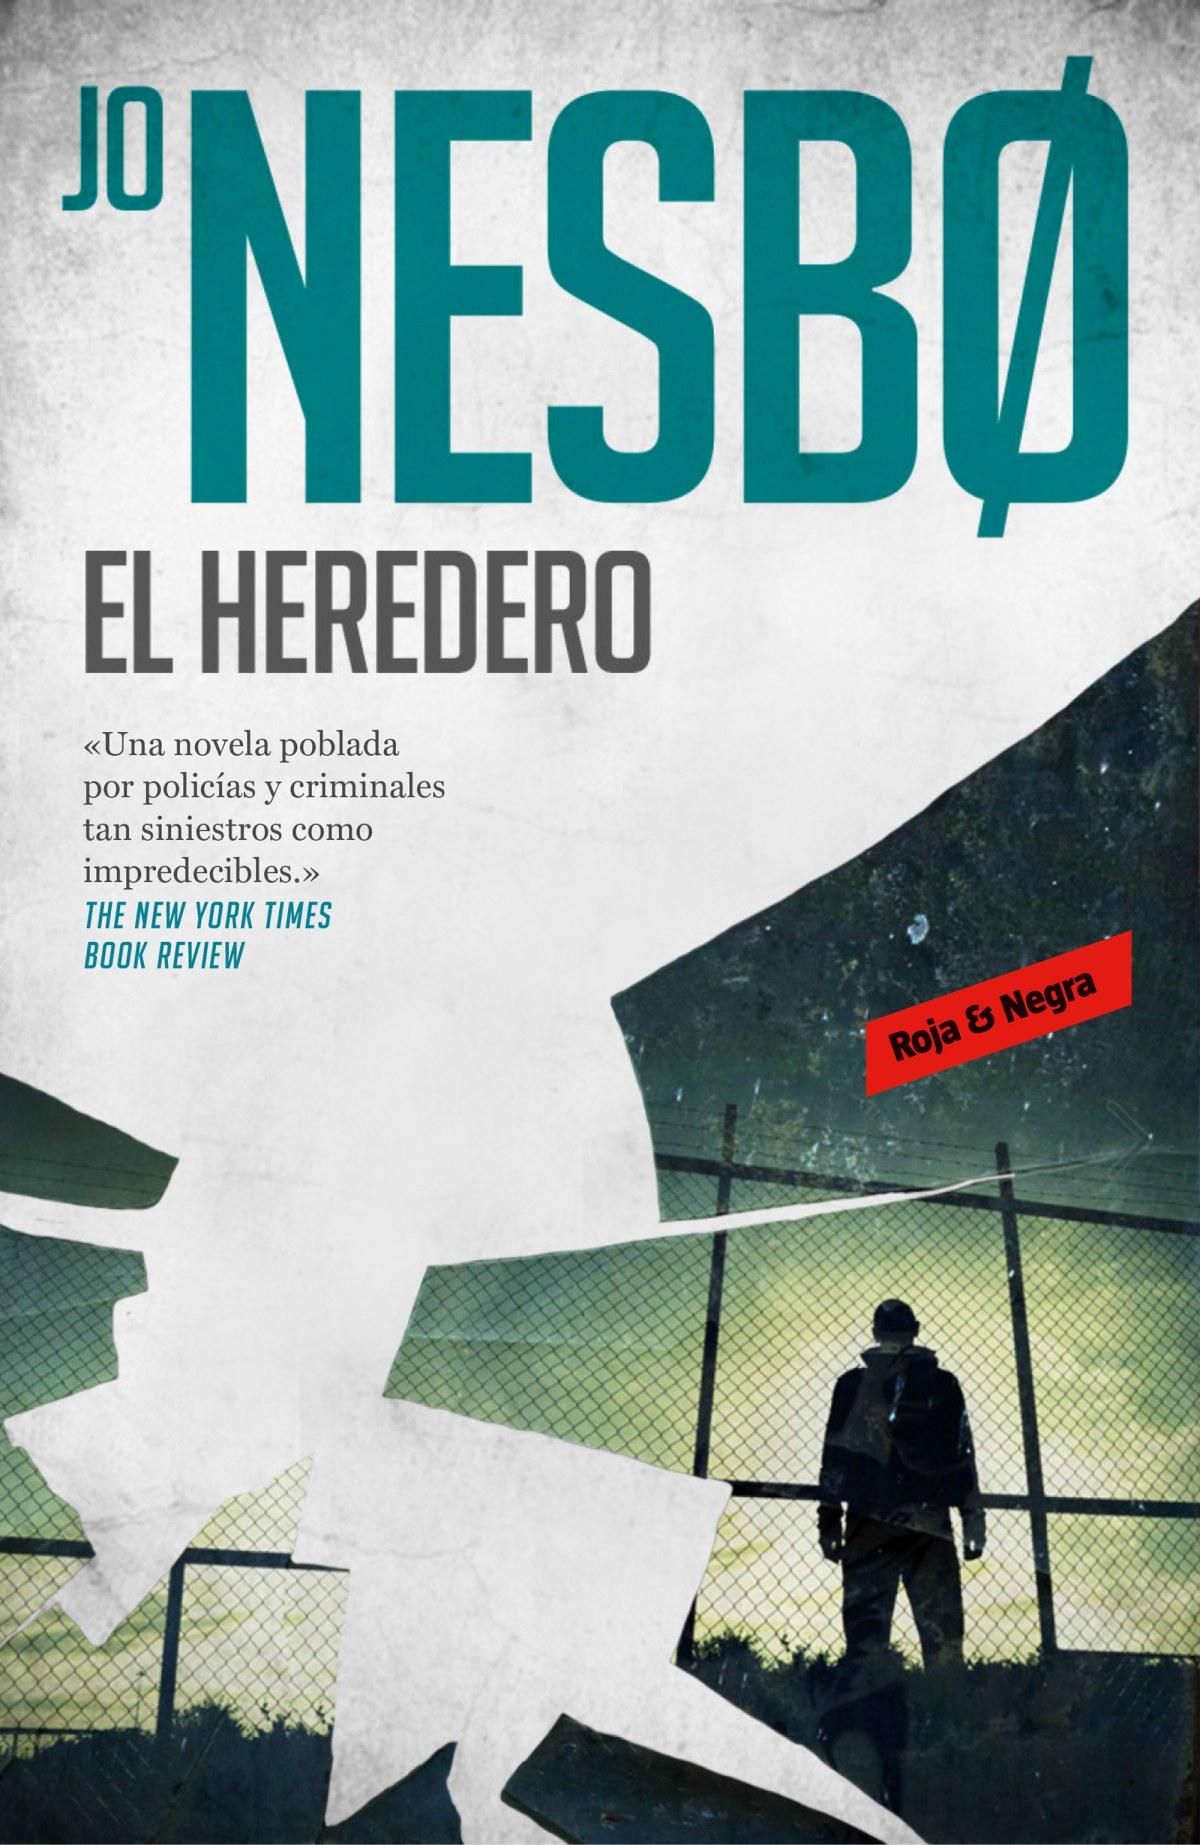 EL HEREDERO 9788416195893